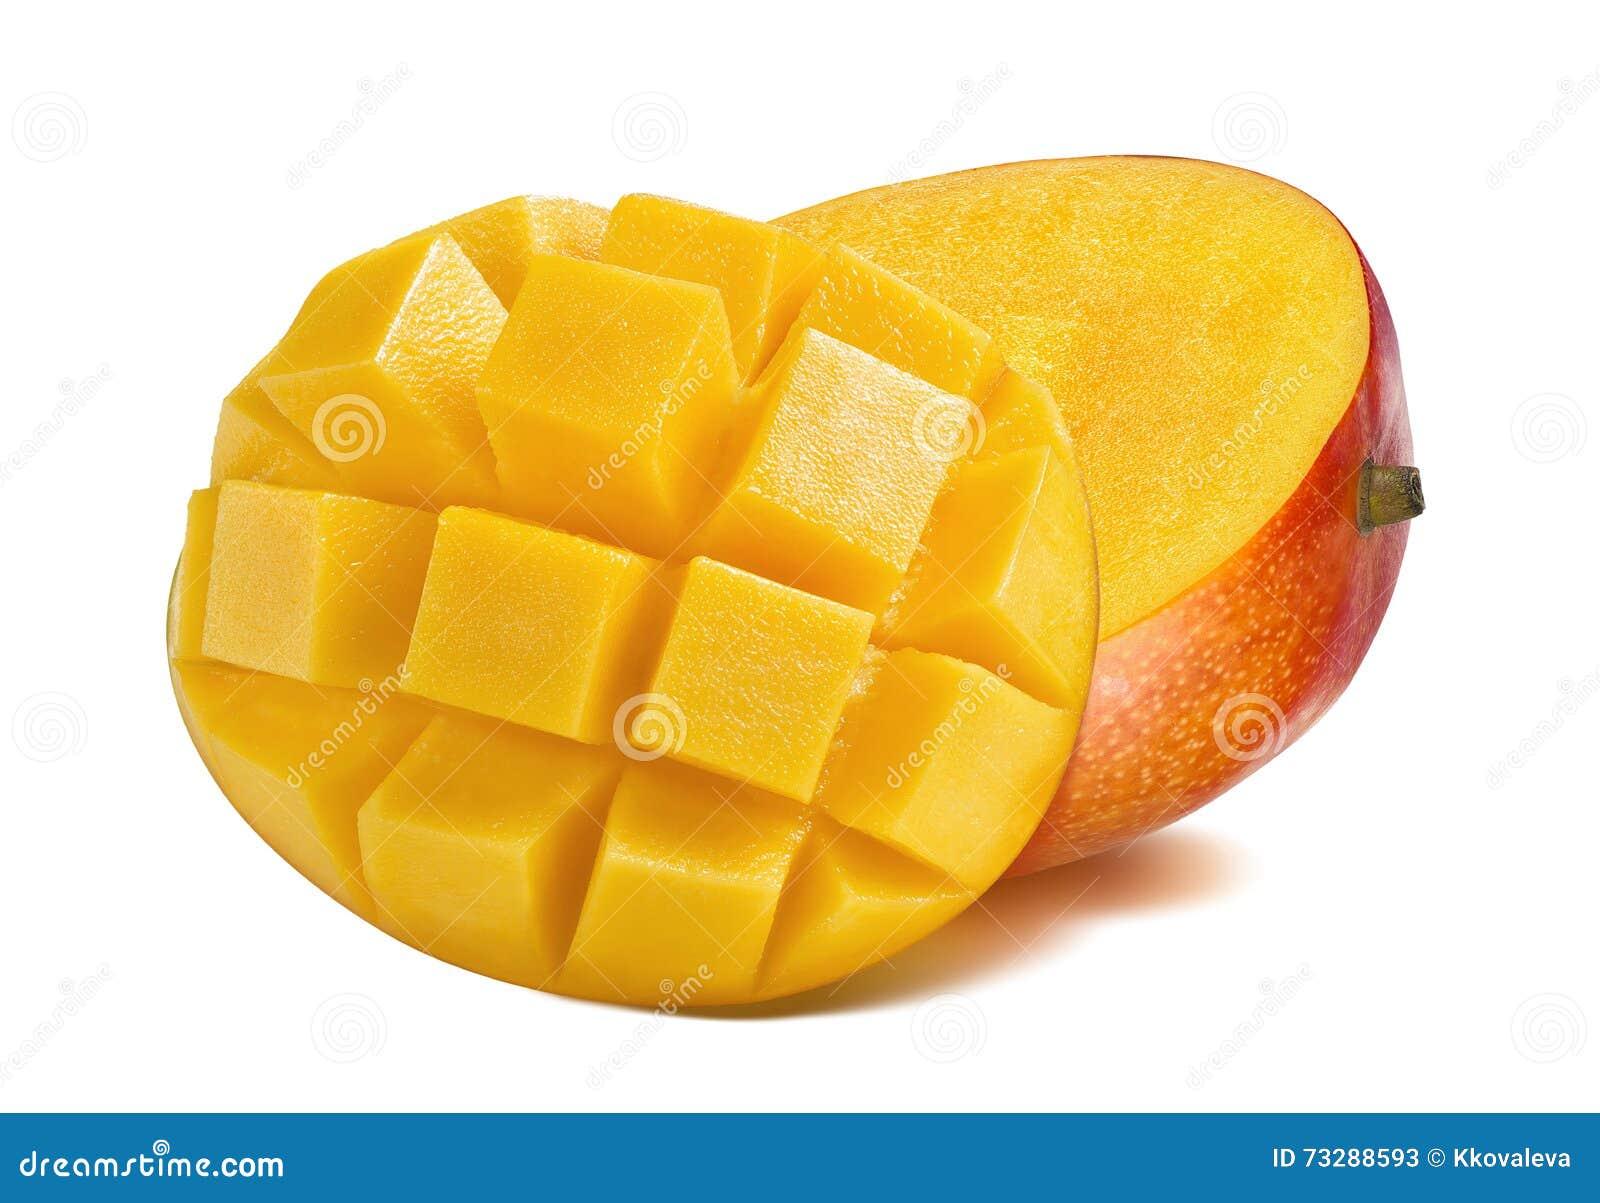 Mangoposition Cut Piece Slice On White Background Stock Photo Mini Mango  Bravo Php495